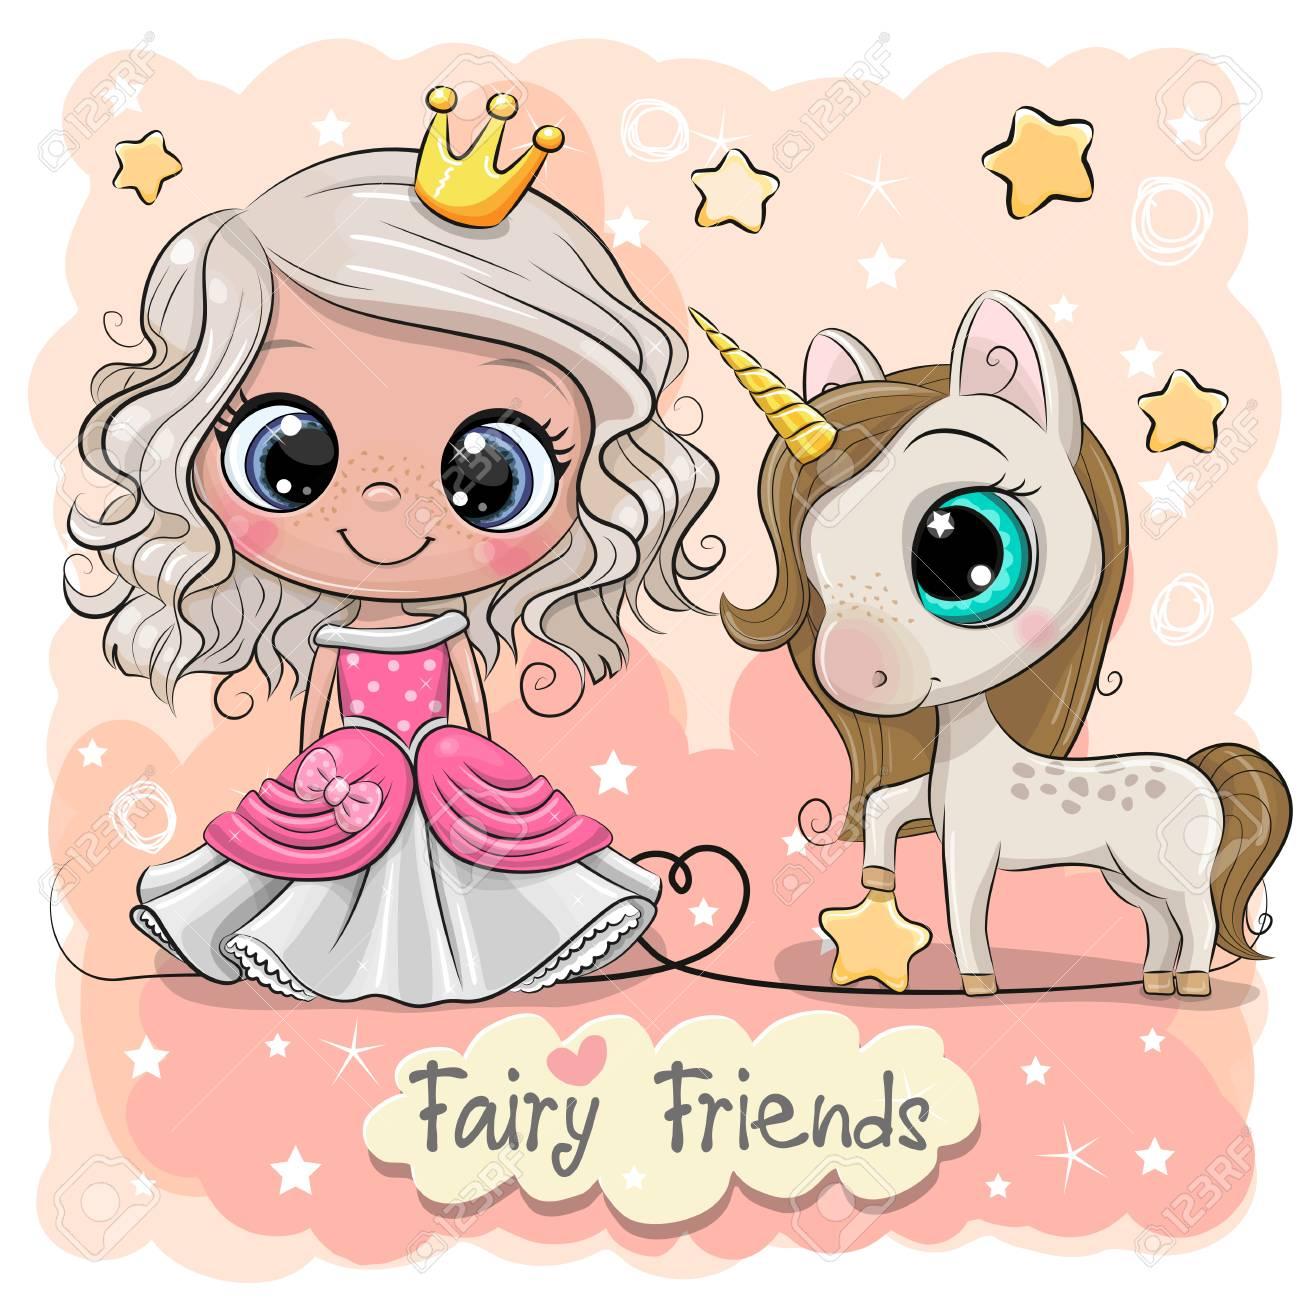 Greeting Card with Cute Cartoon fairy tale Princess and Unicorn - 122187942